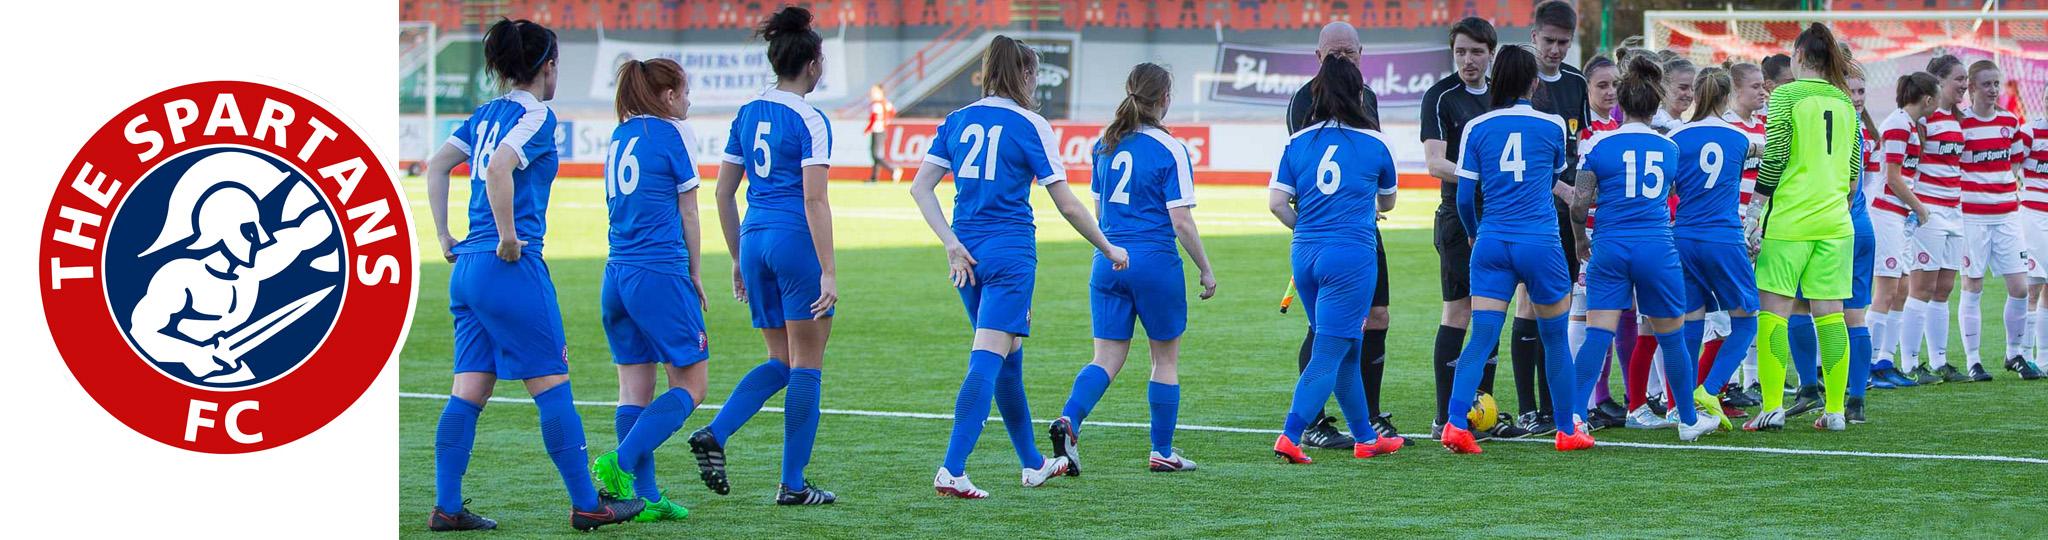 Spartans FC - Scottish Womens Premier League Team based in Edinburgh 3a8727f0d